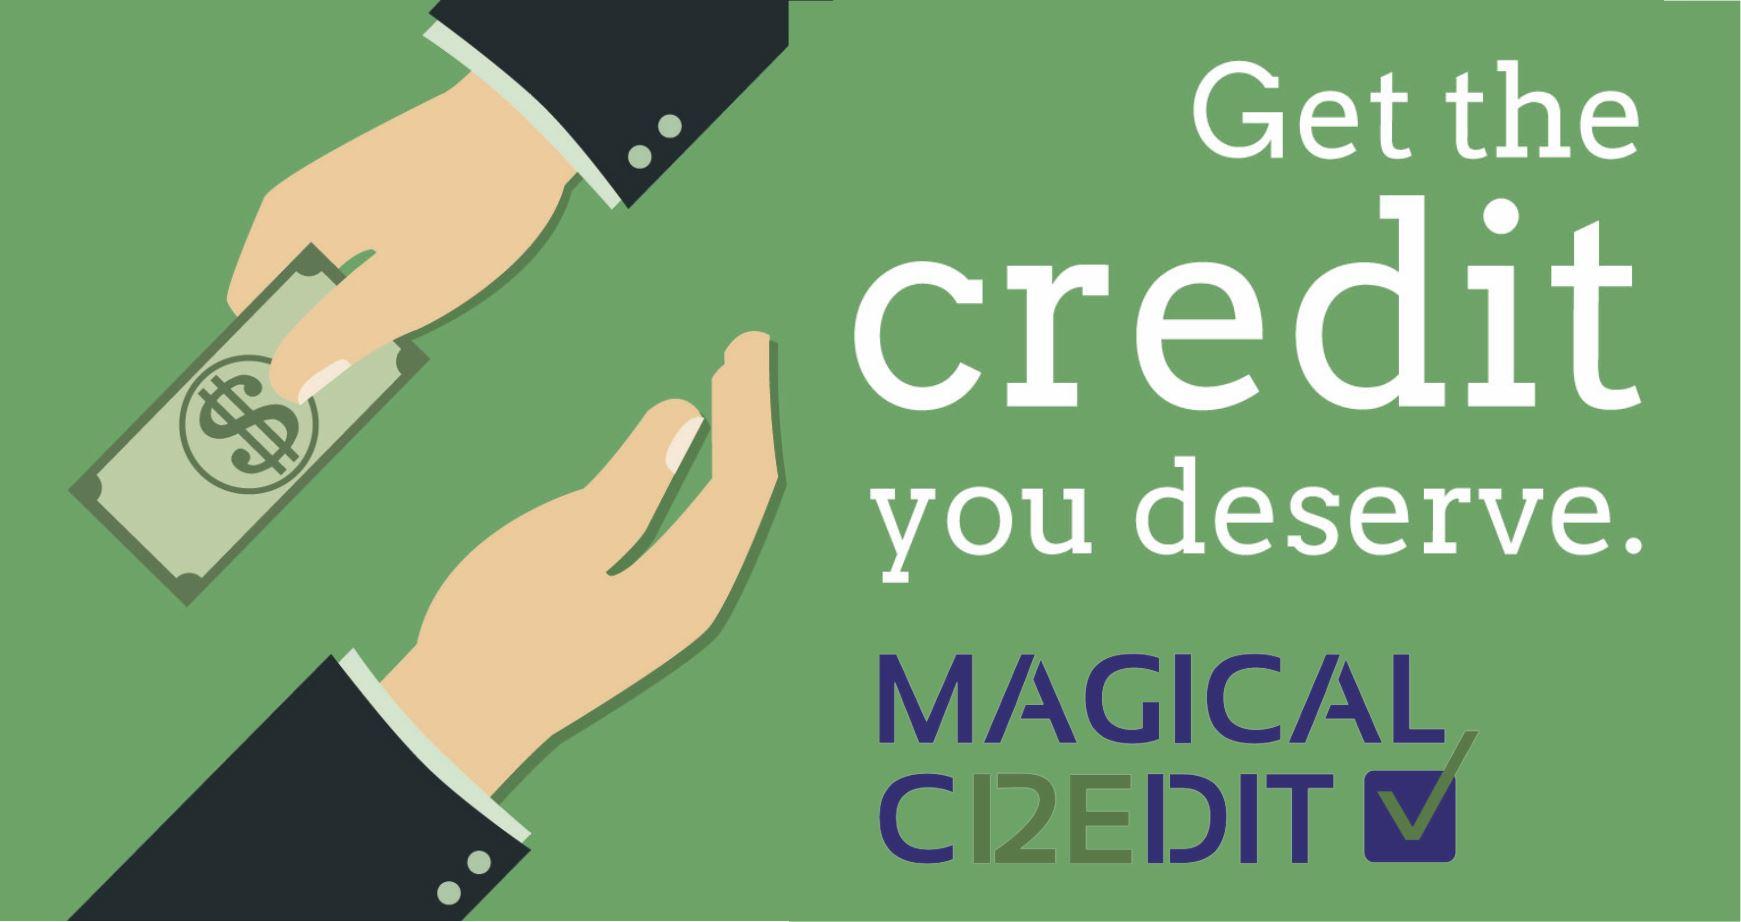 Magical Credit Header